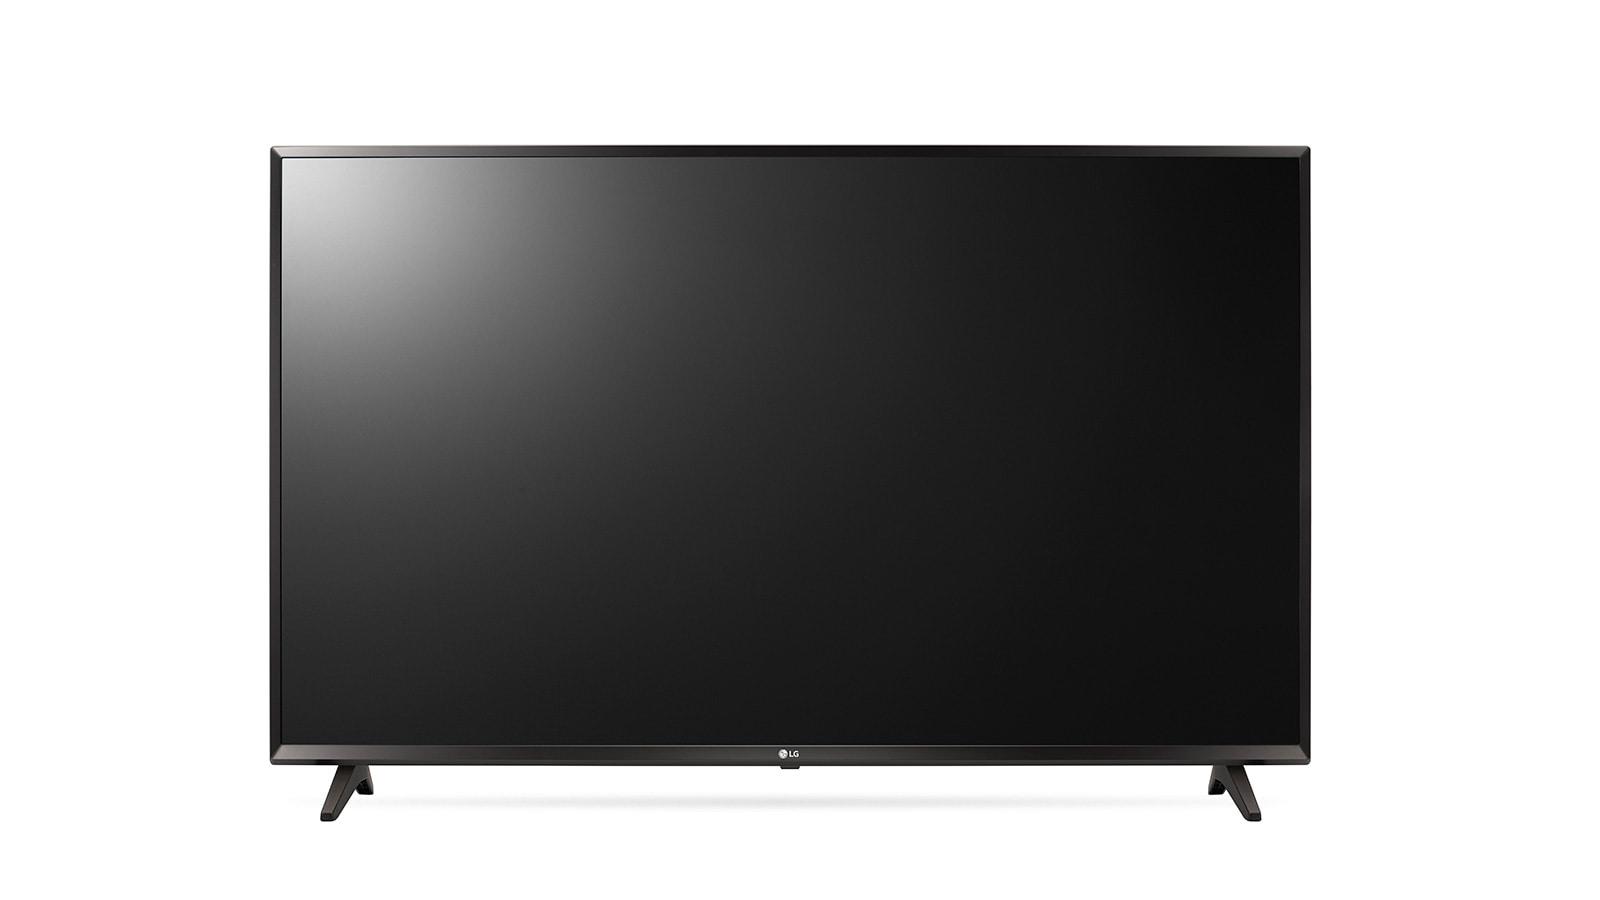 LG UHD TV 4K FULL HD - LG 49 UJ6320 | LG Electronics PH